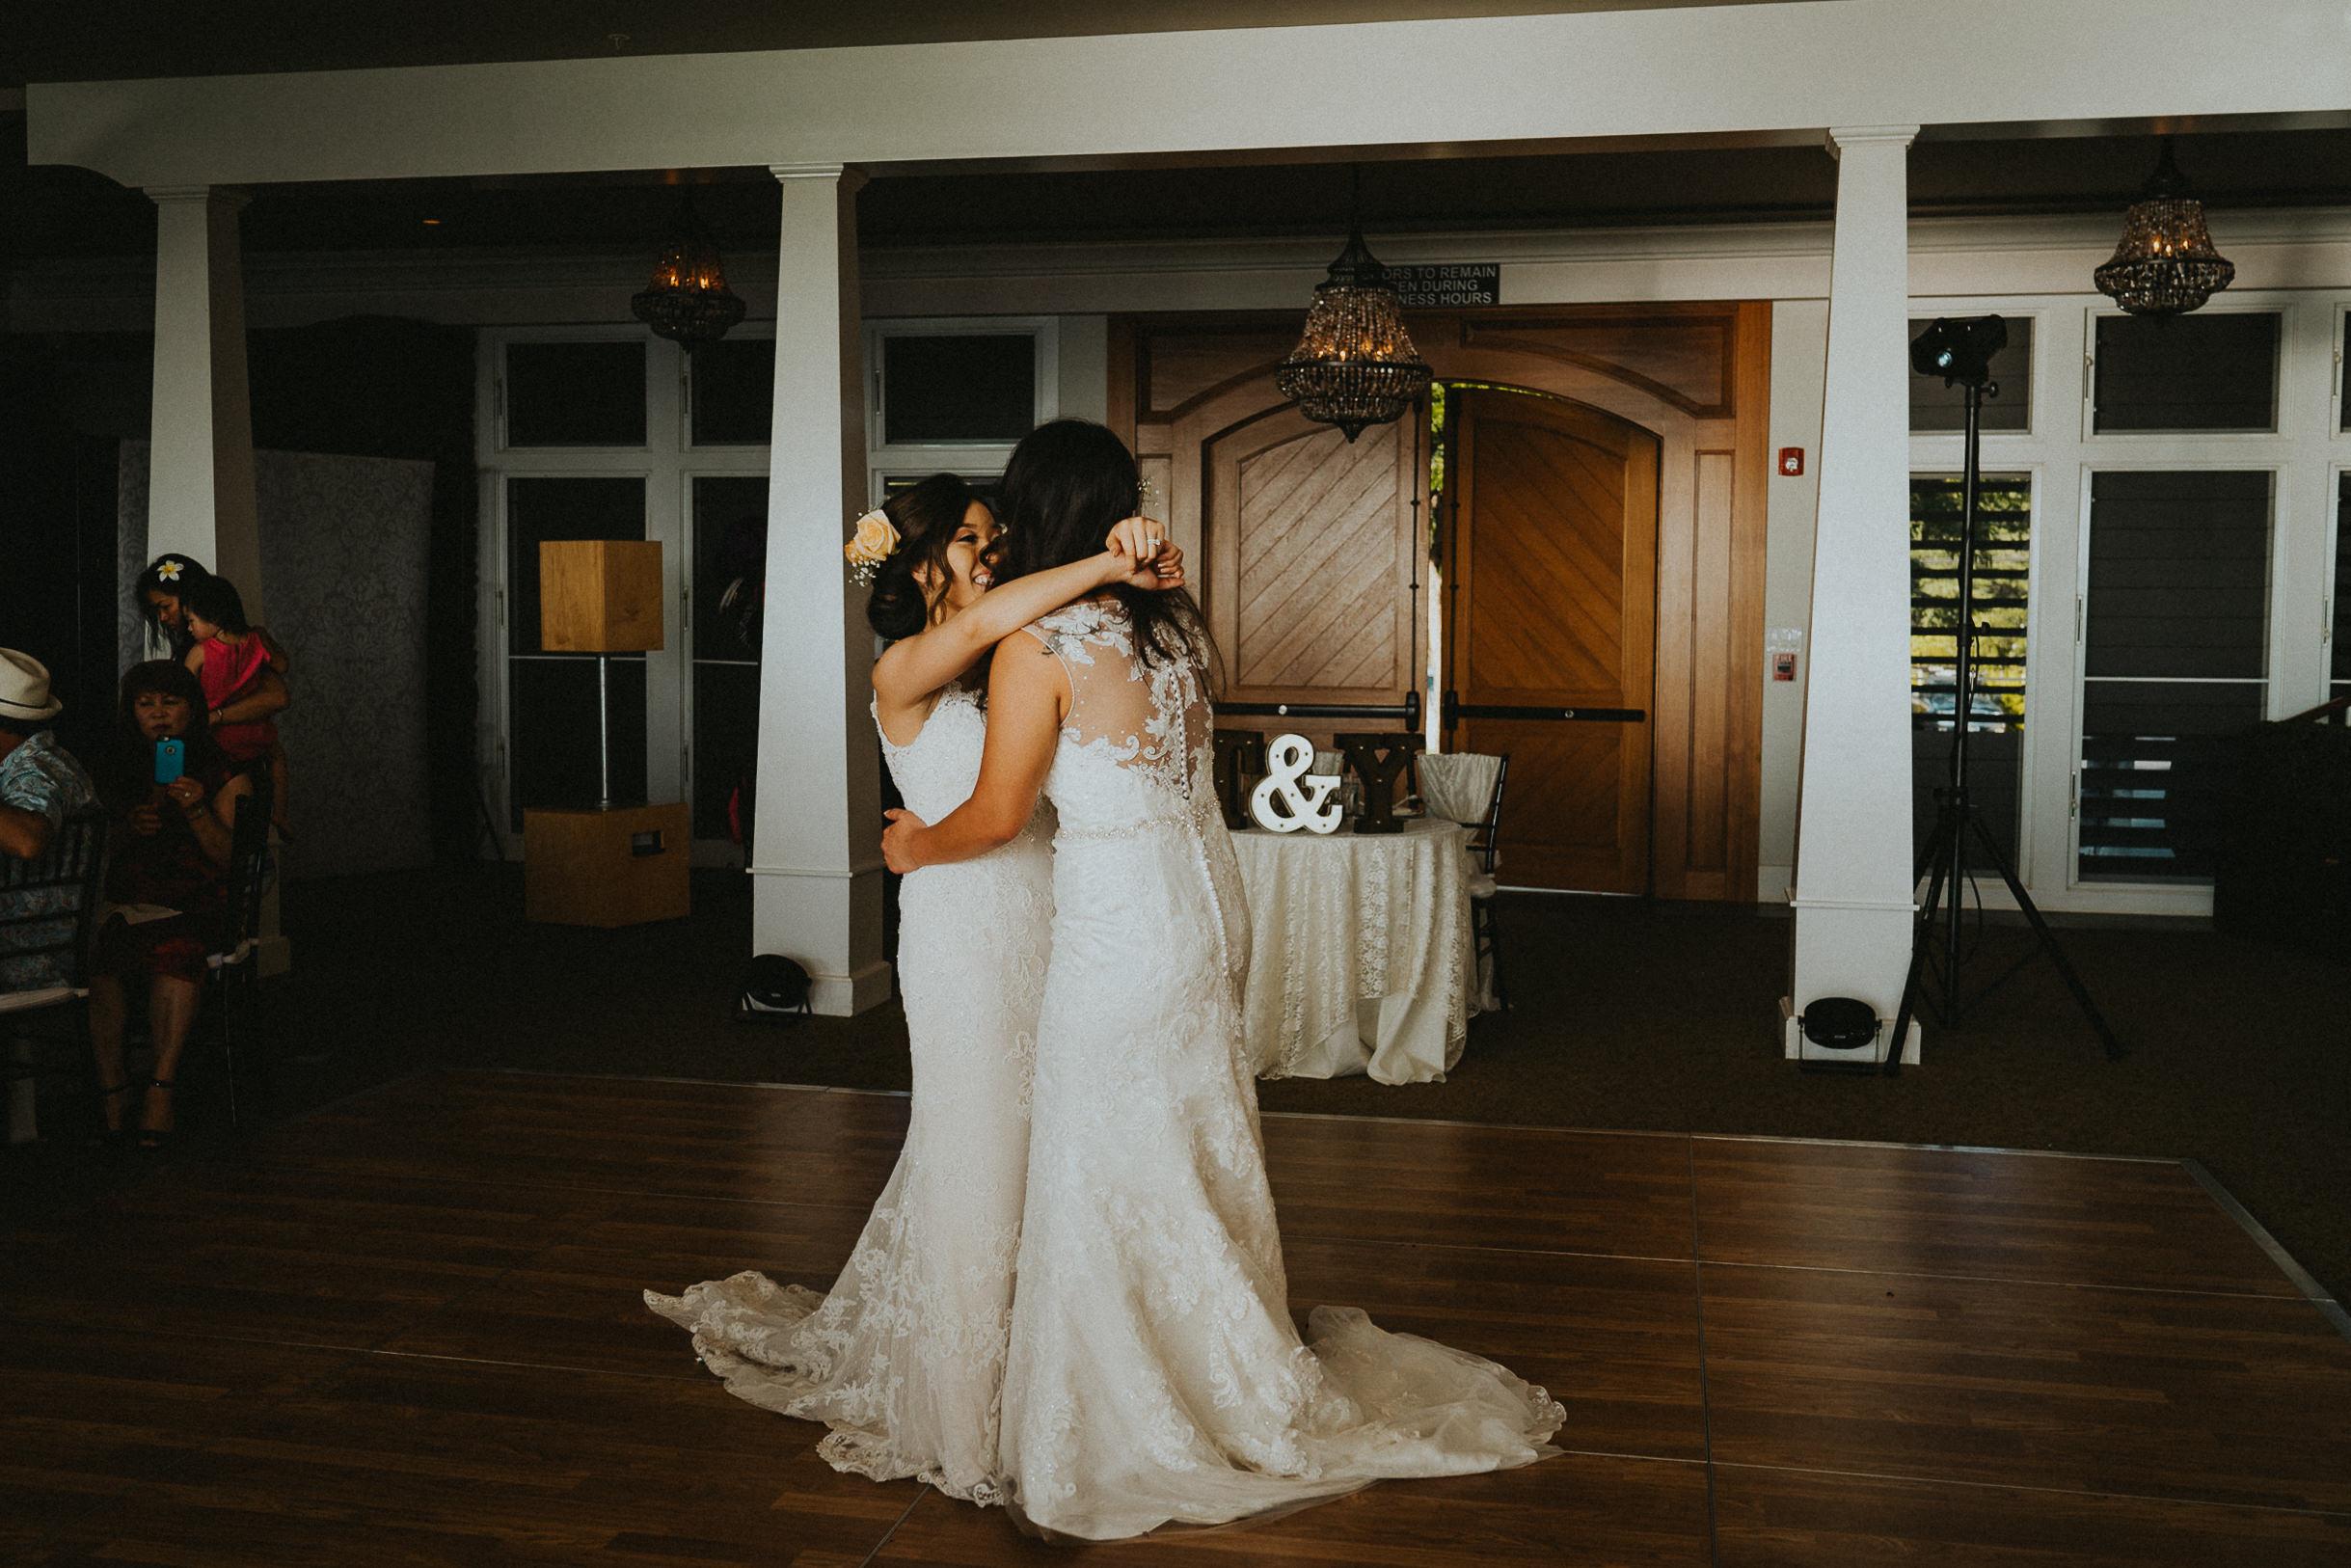 Maui_Destination_wedding_Alfred_Tang-39.jpg